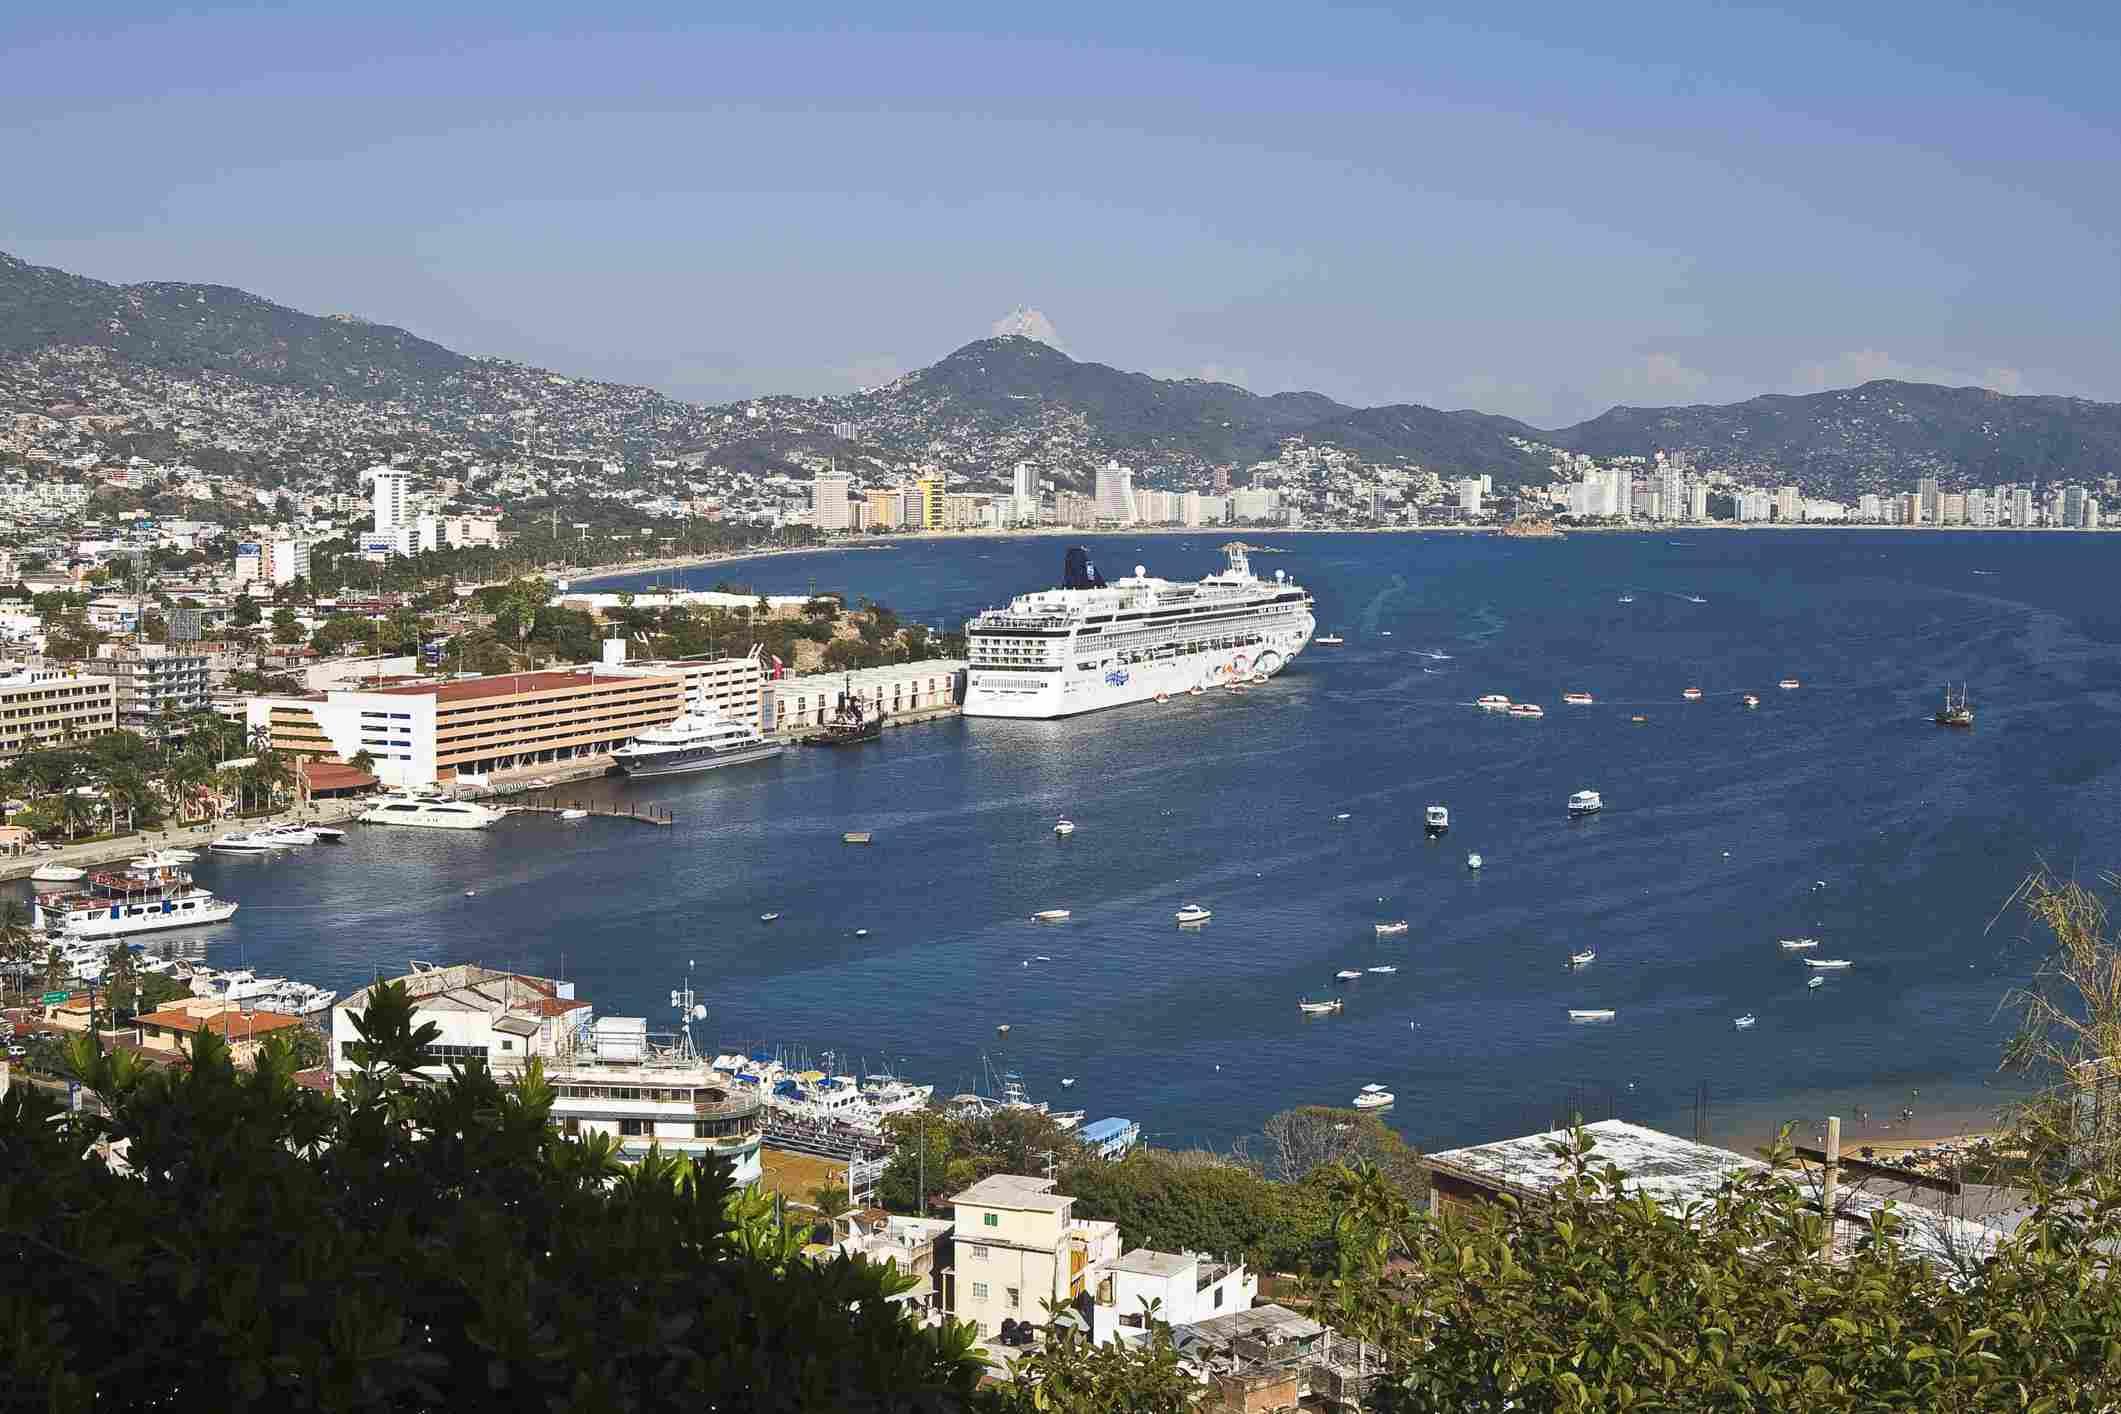 Cruise ship in Acapulco Bay